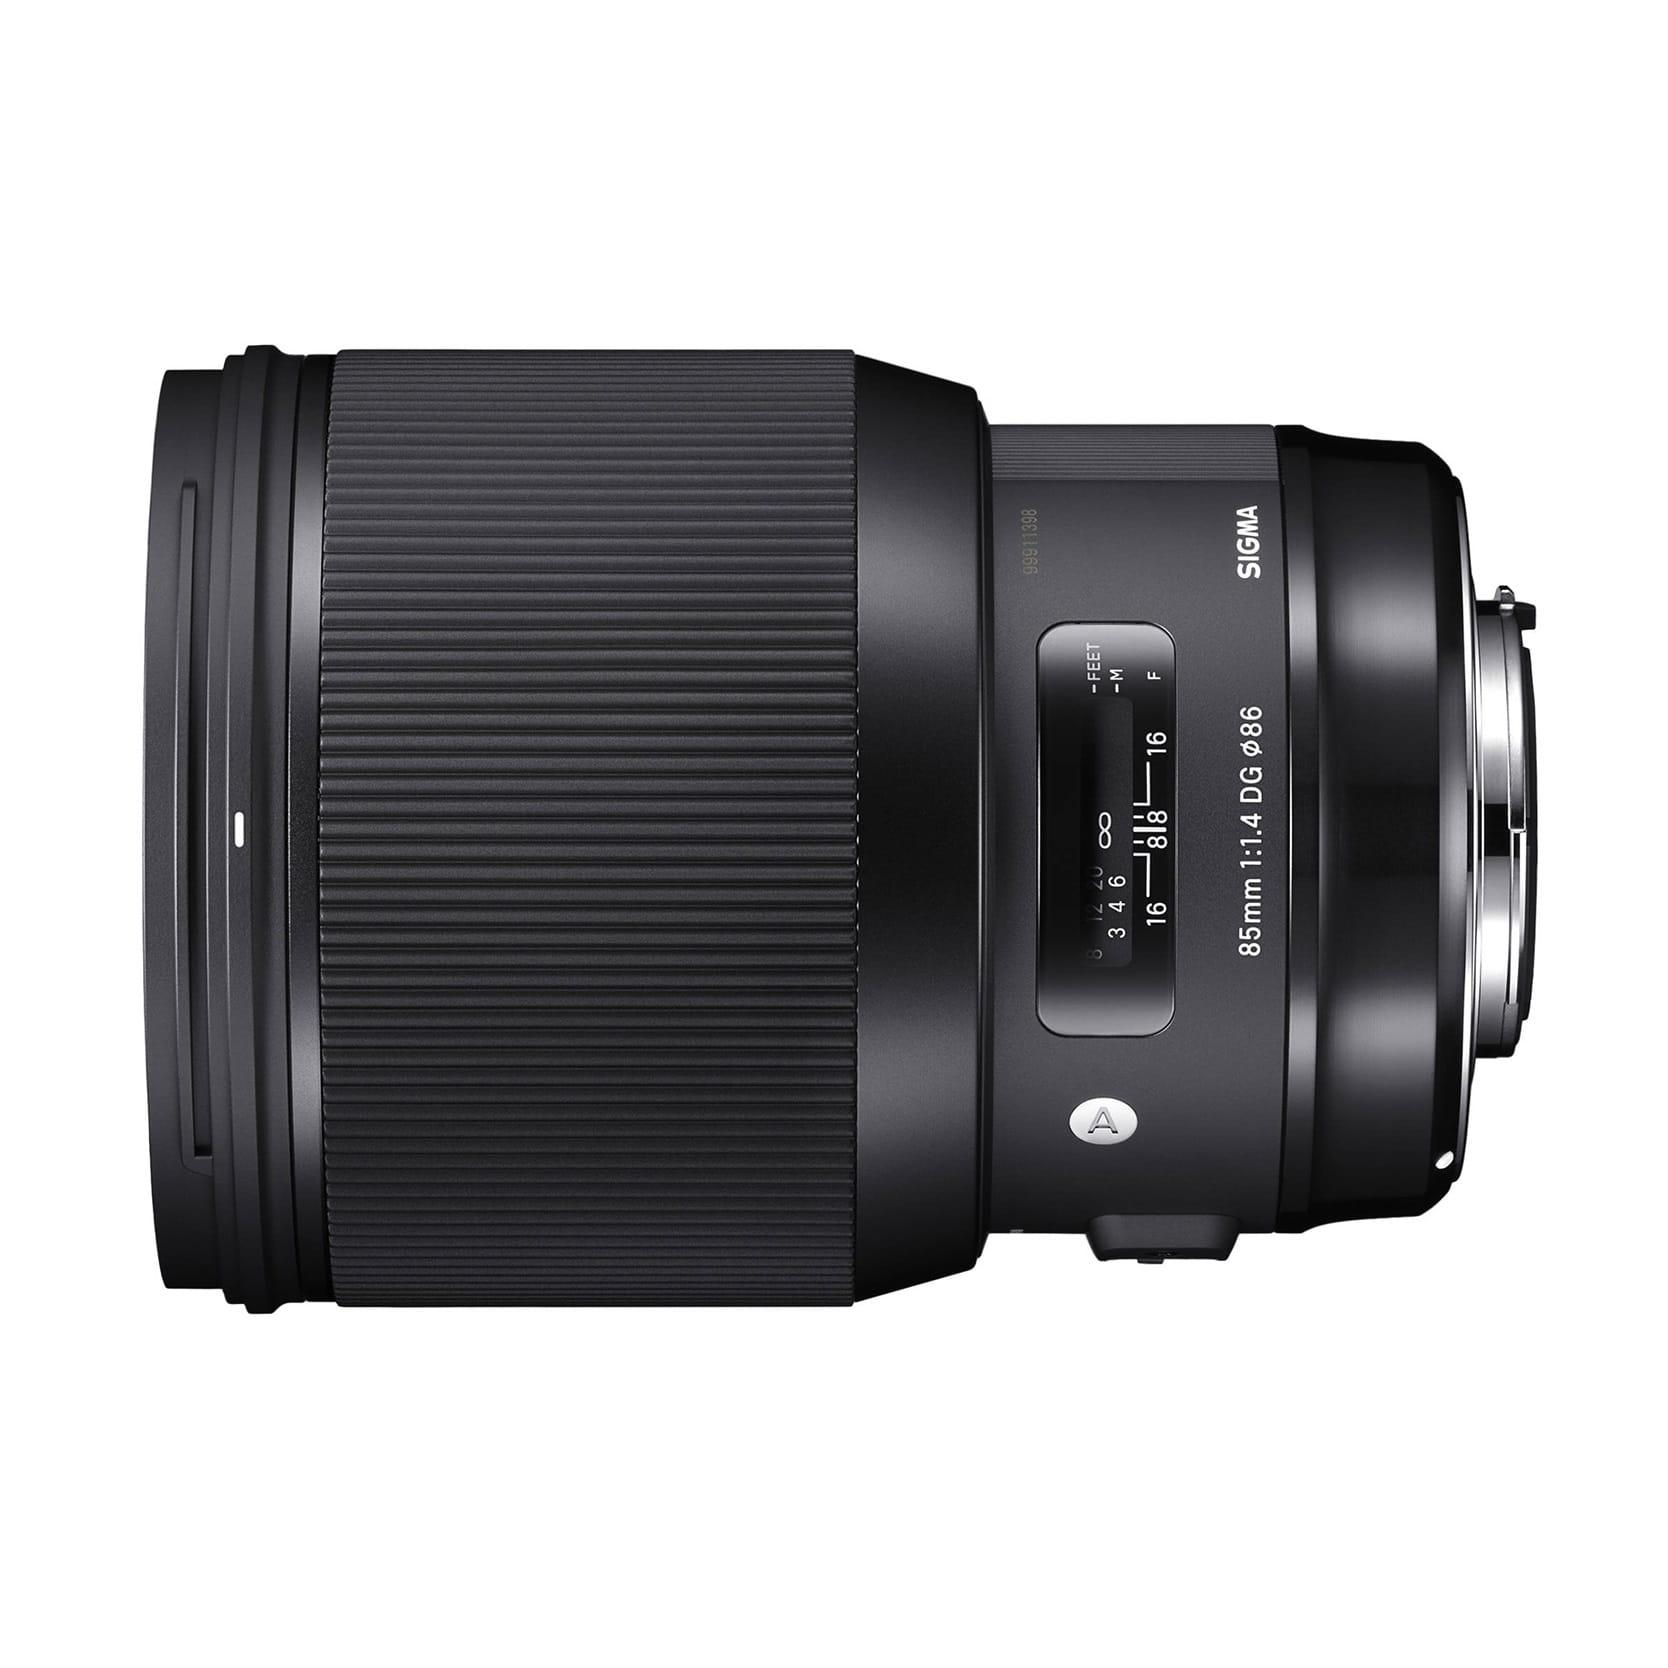 Sigma A 85mm F/1.4 DG HSM Nikon